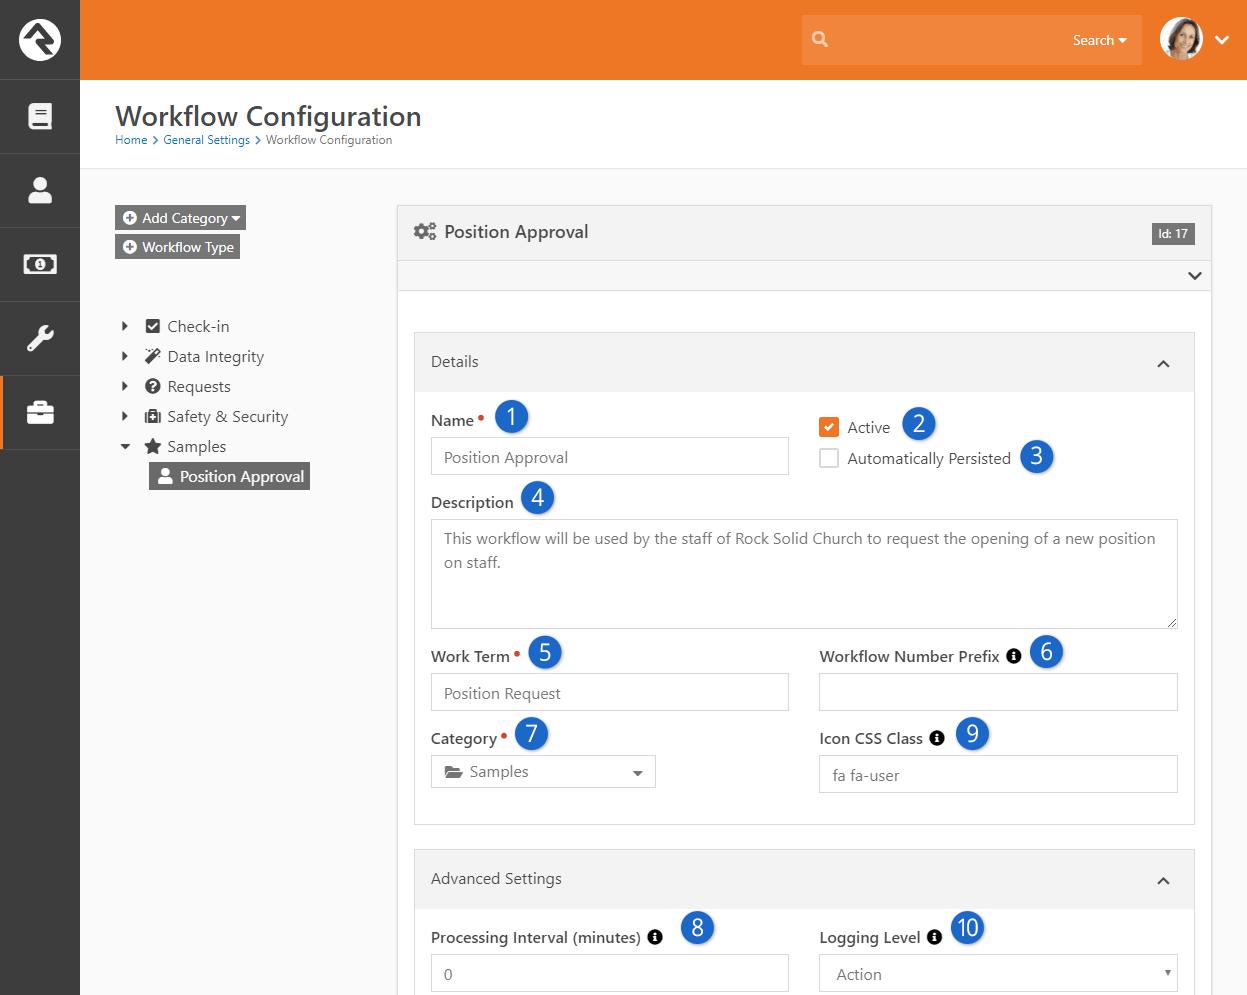 Workflow Type Details